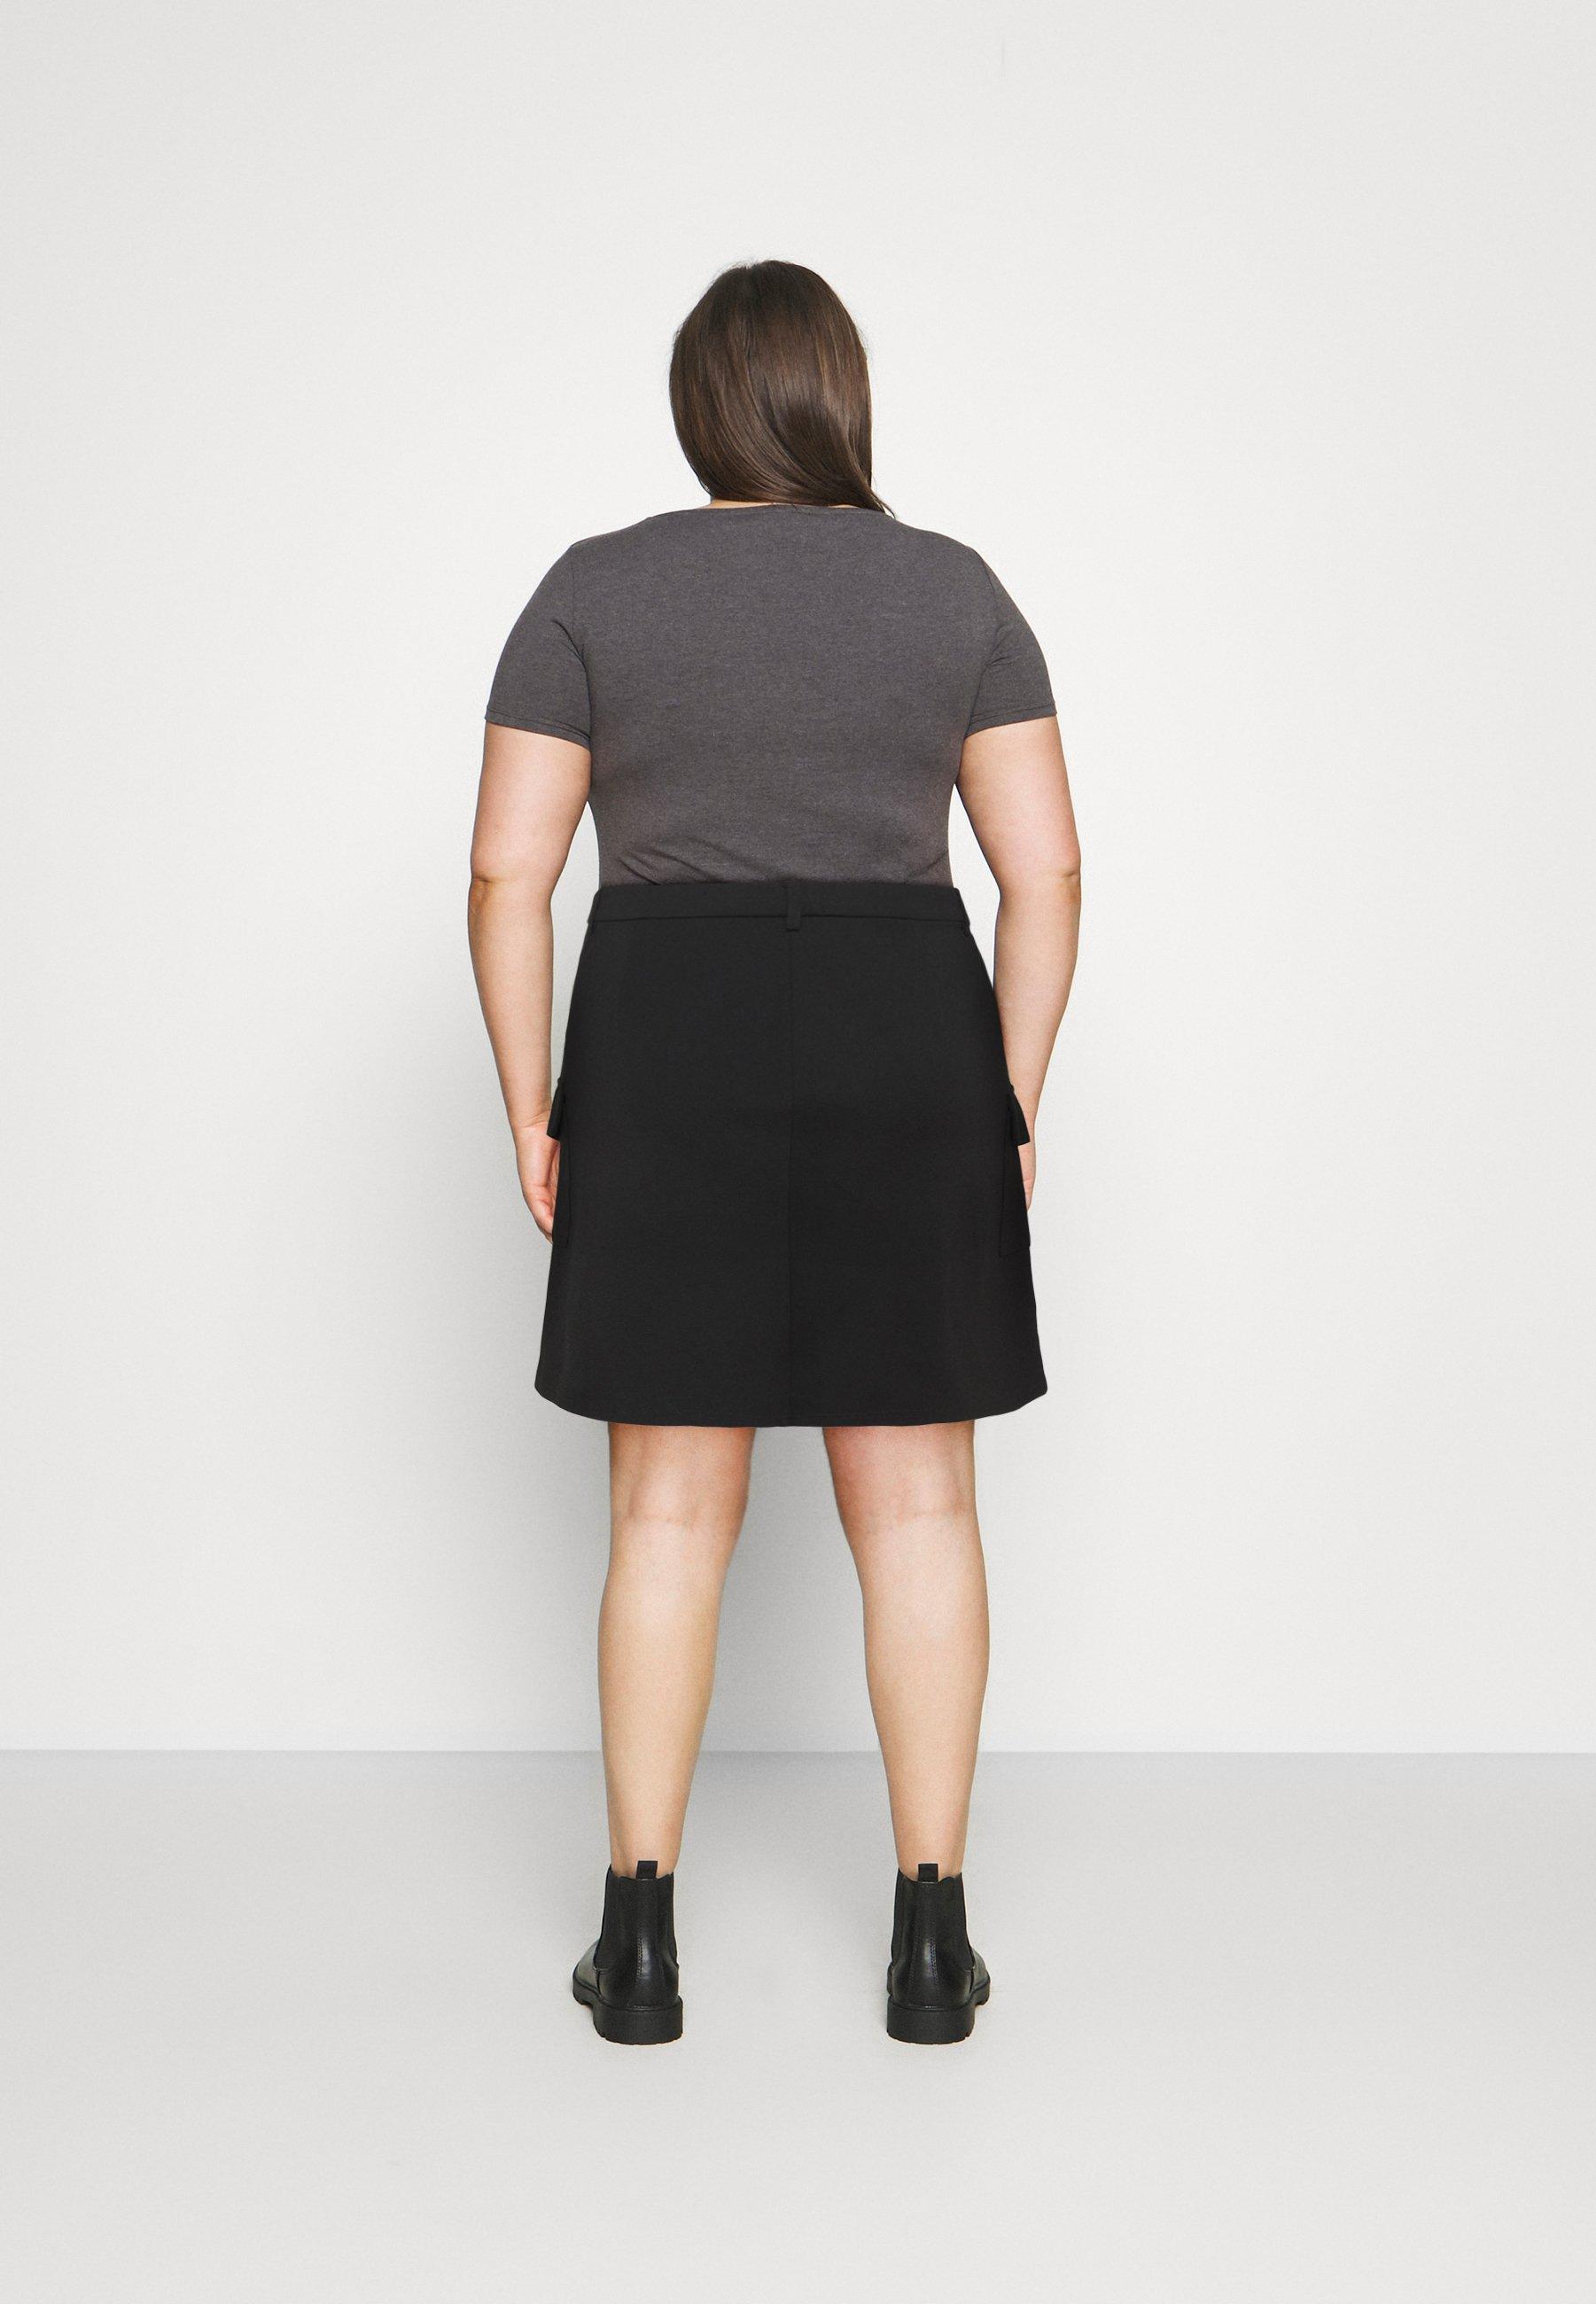 Femme NMHIPE PALMA SKIRT  - Minijupe